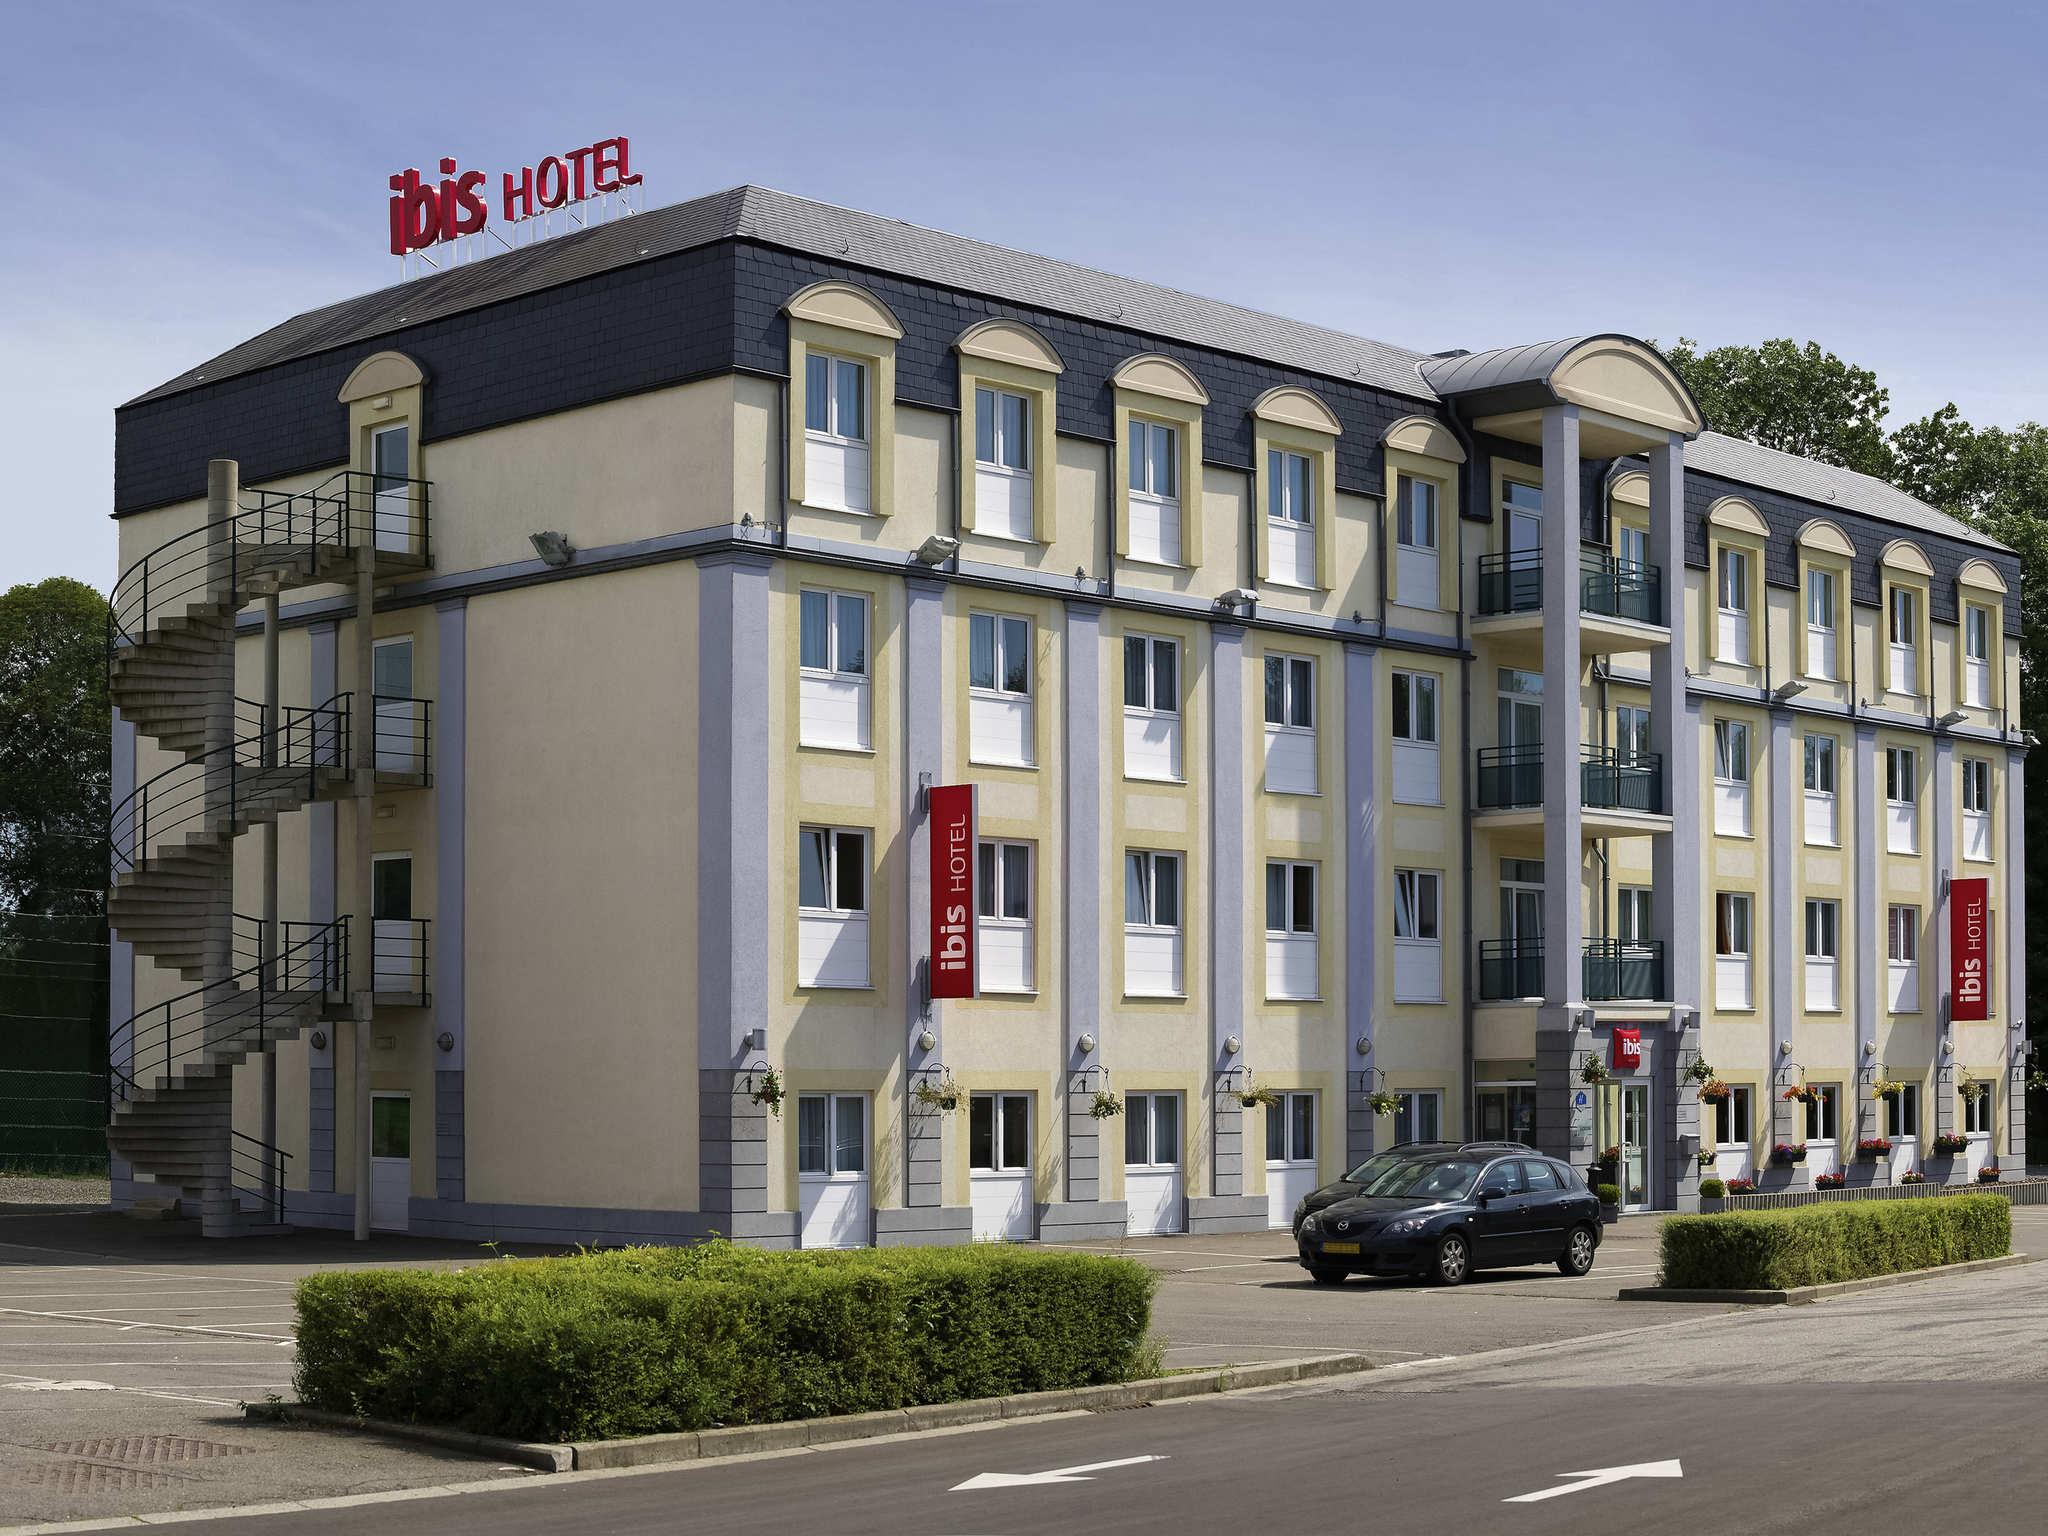 L'hôtel Seraing Ibis - copyright photo Seraing Ibis